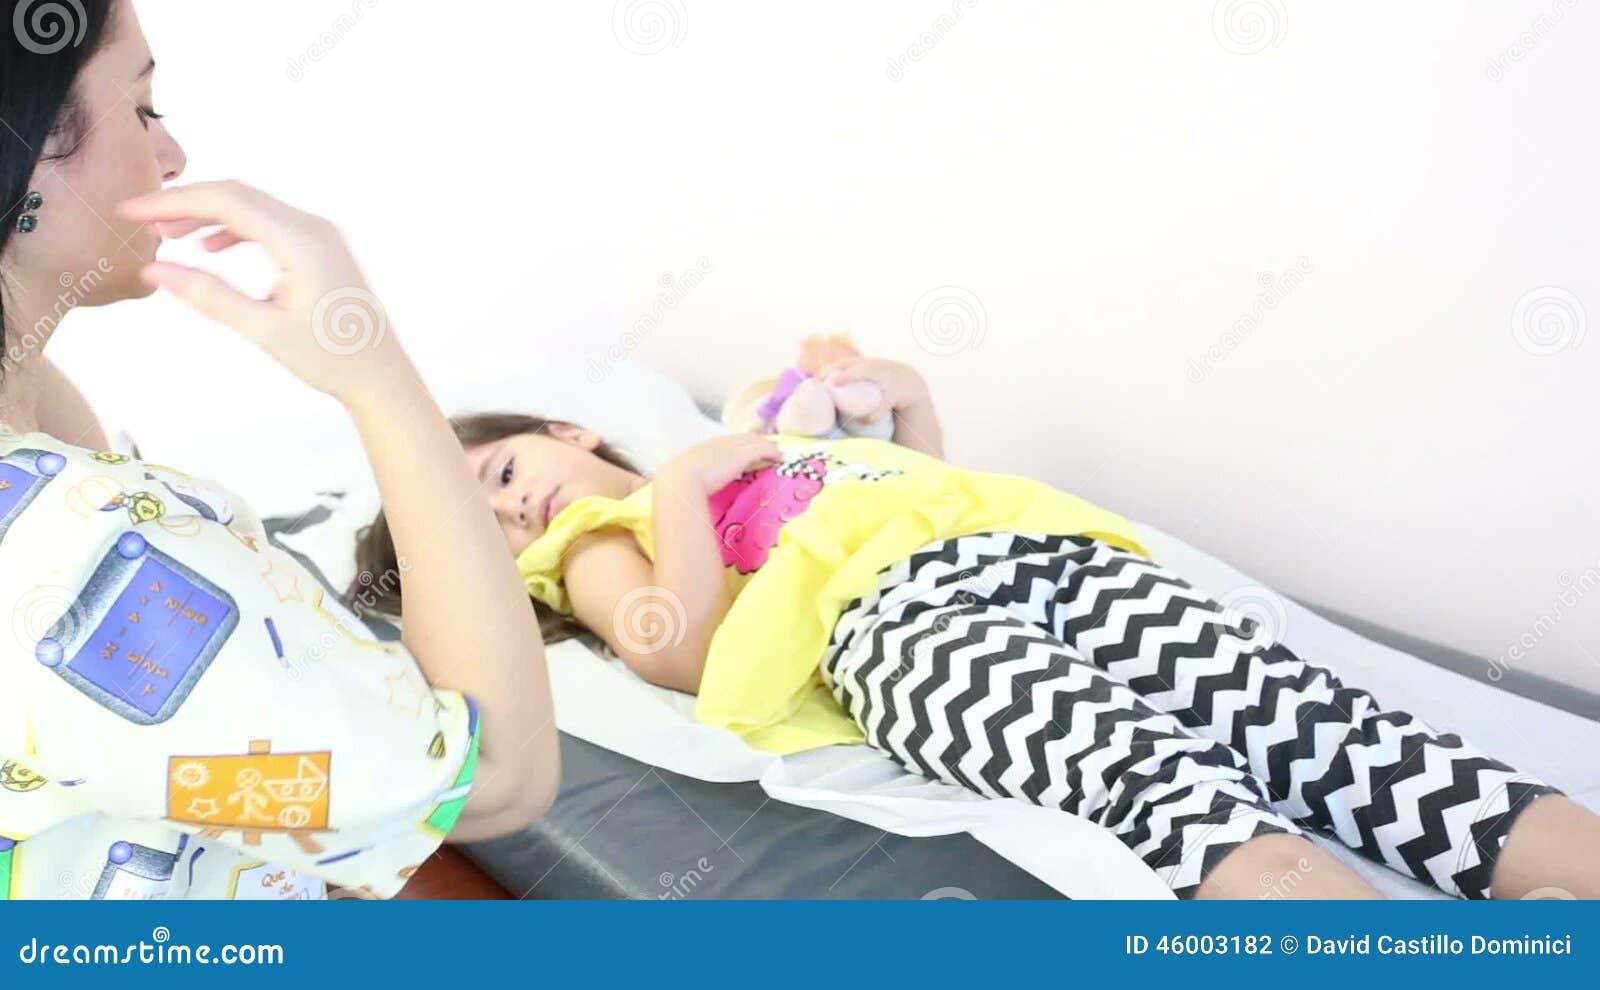 kietel massage